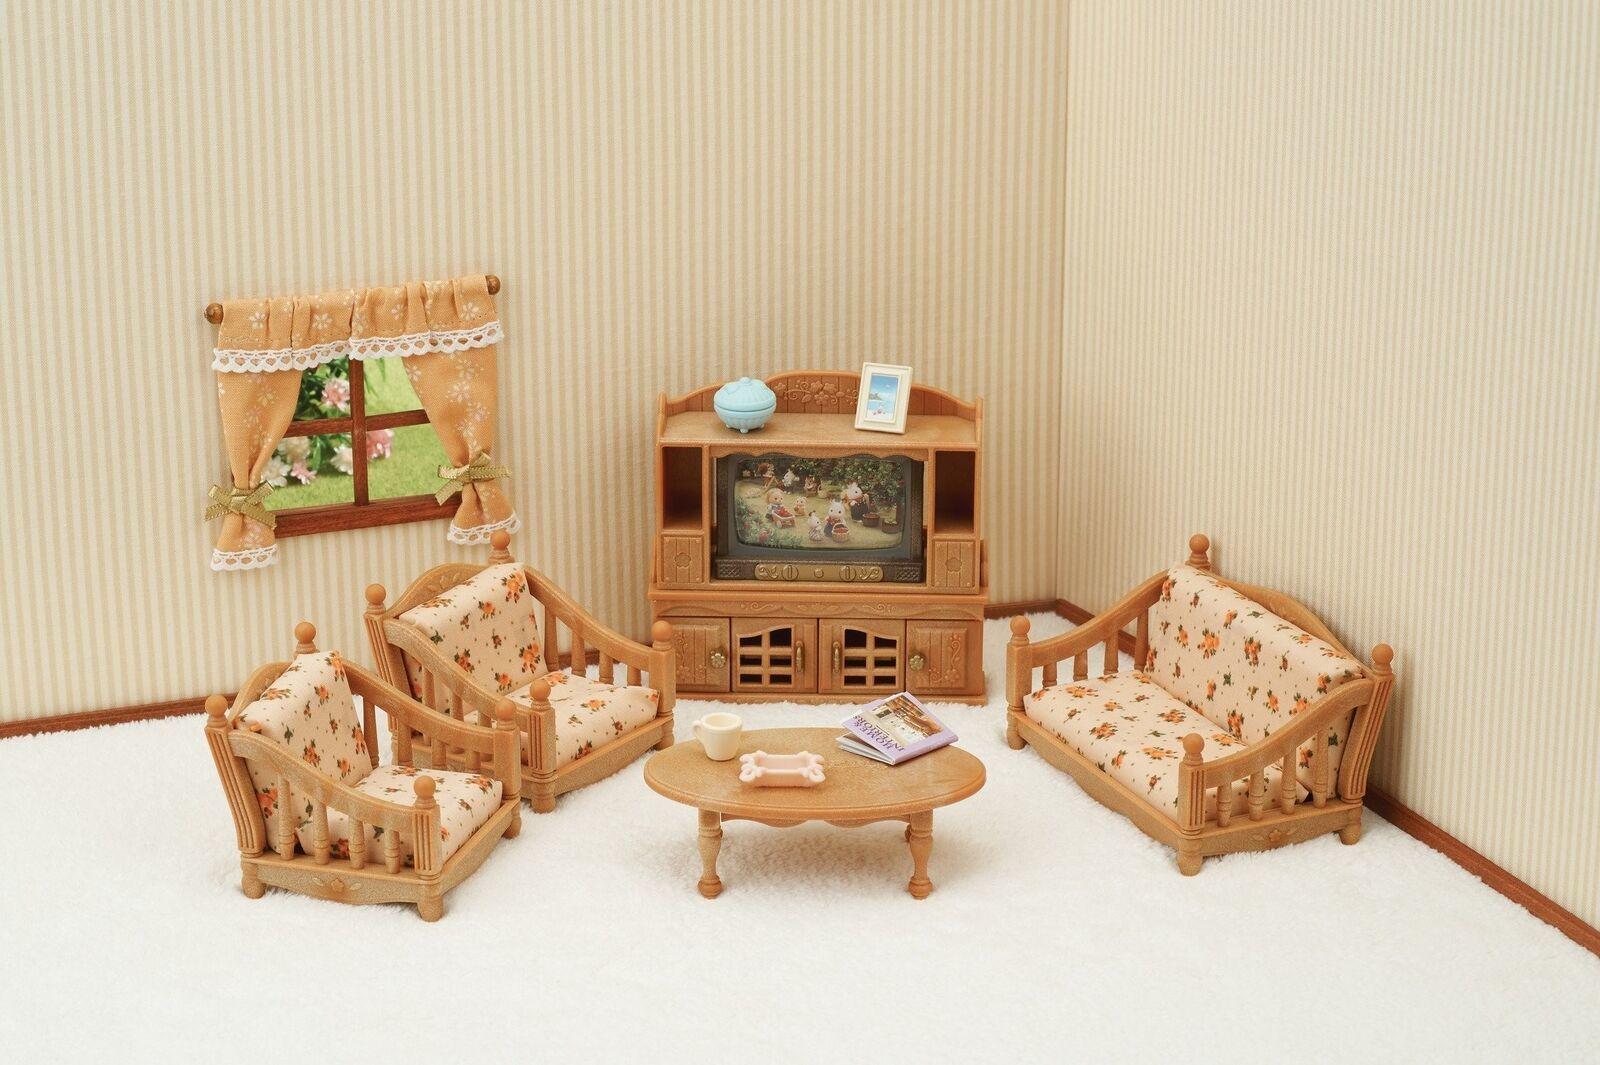 Sylvanian Families - Comfy Living Room Set image